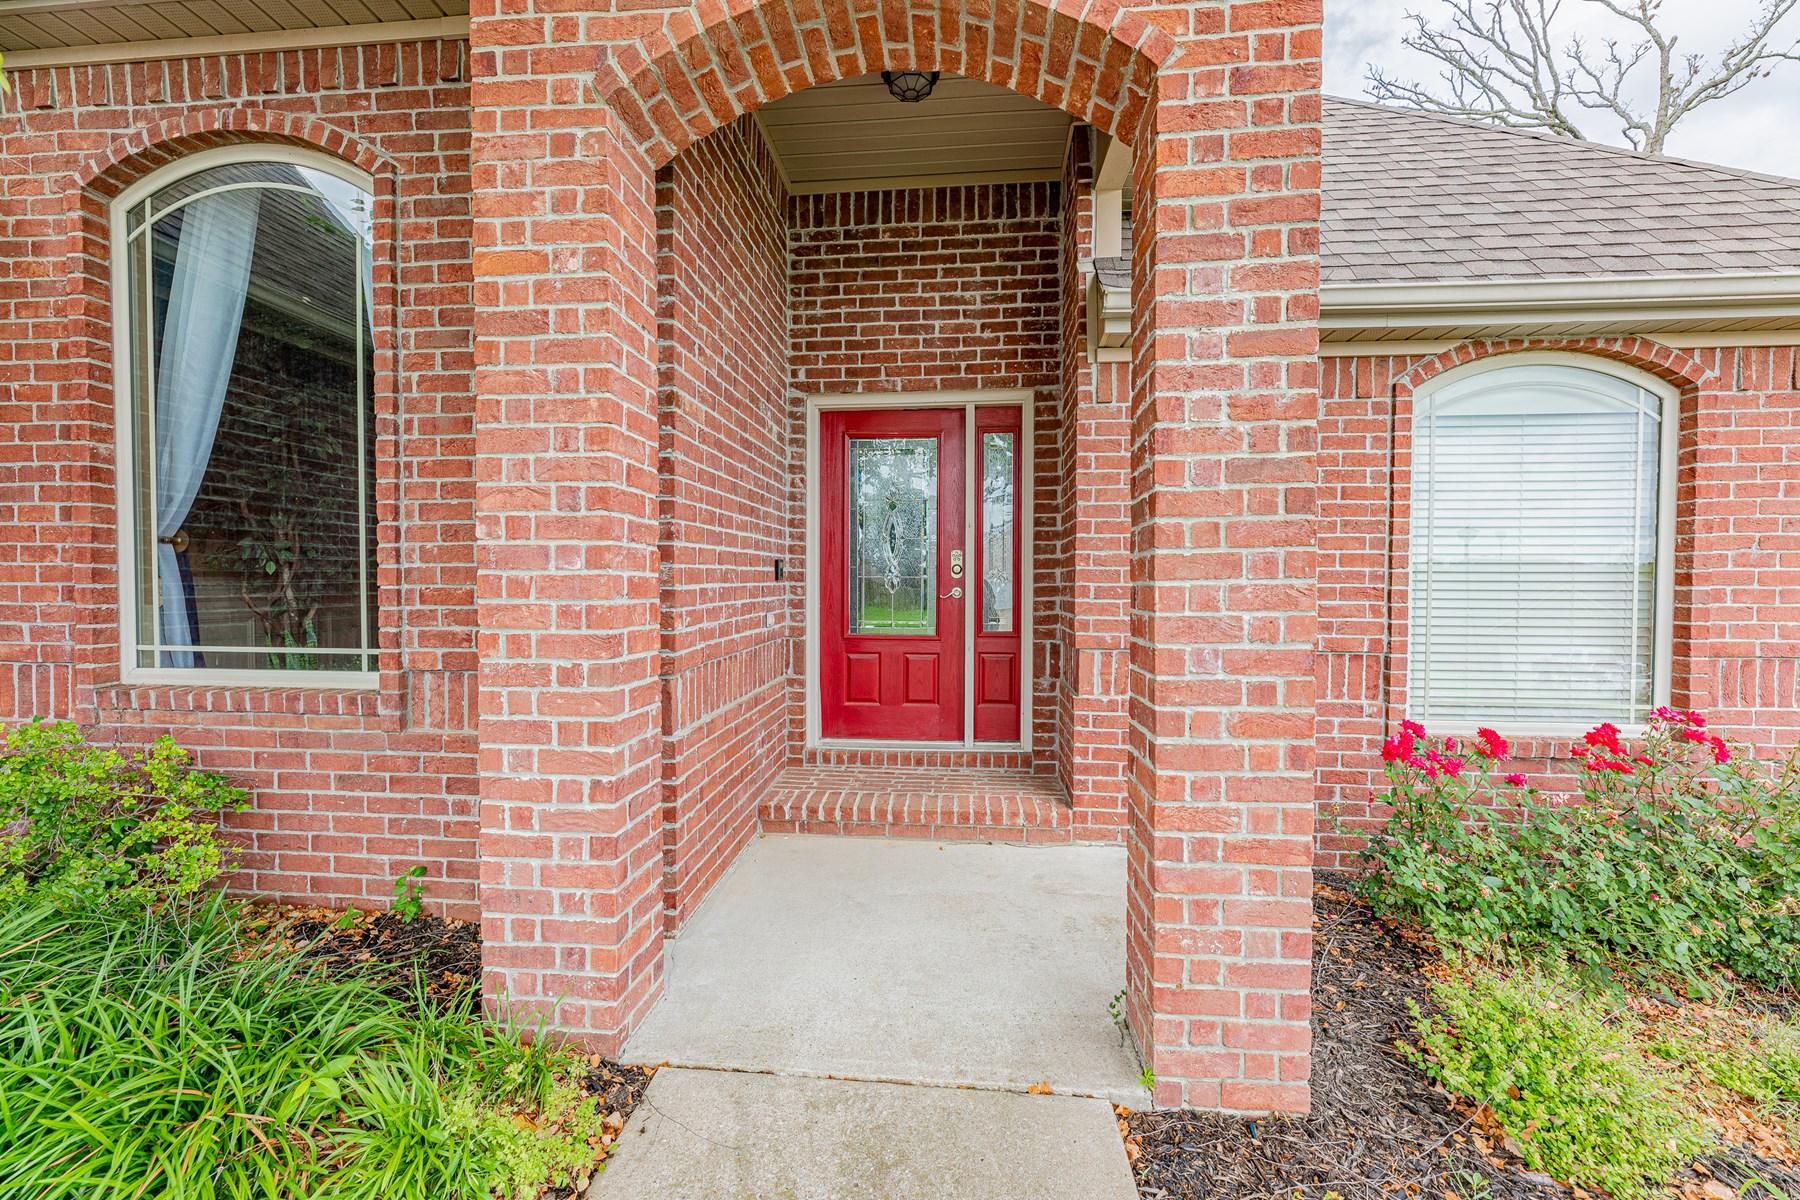 5 Bedroom 3 Bathroom Home For Sale In Centerton, Arkansas